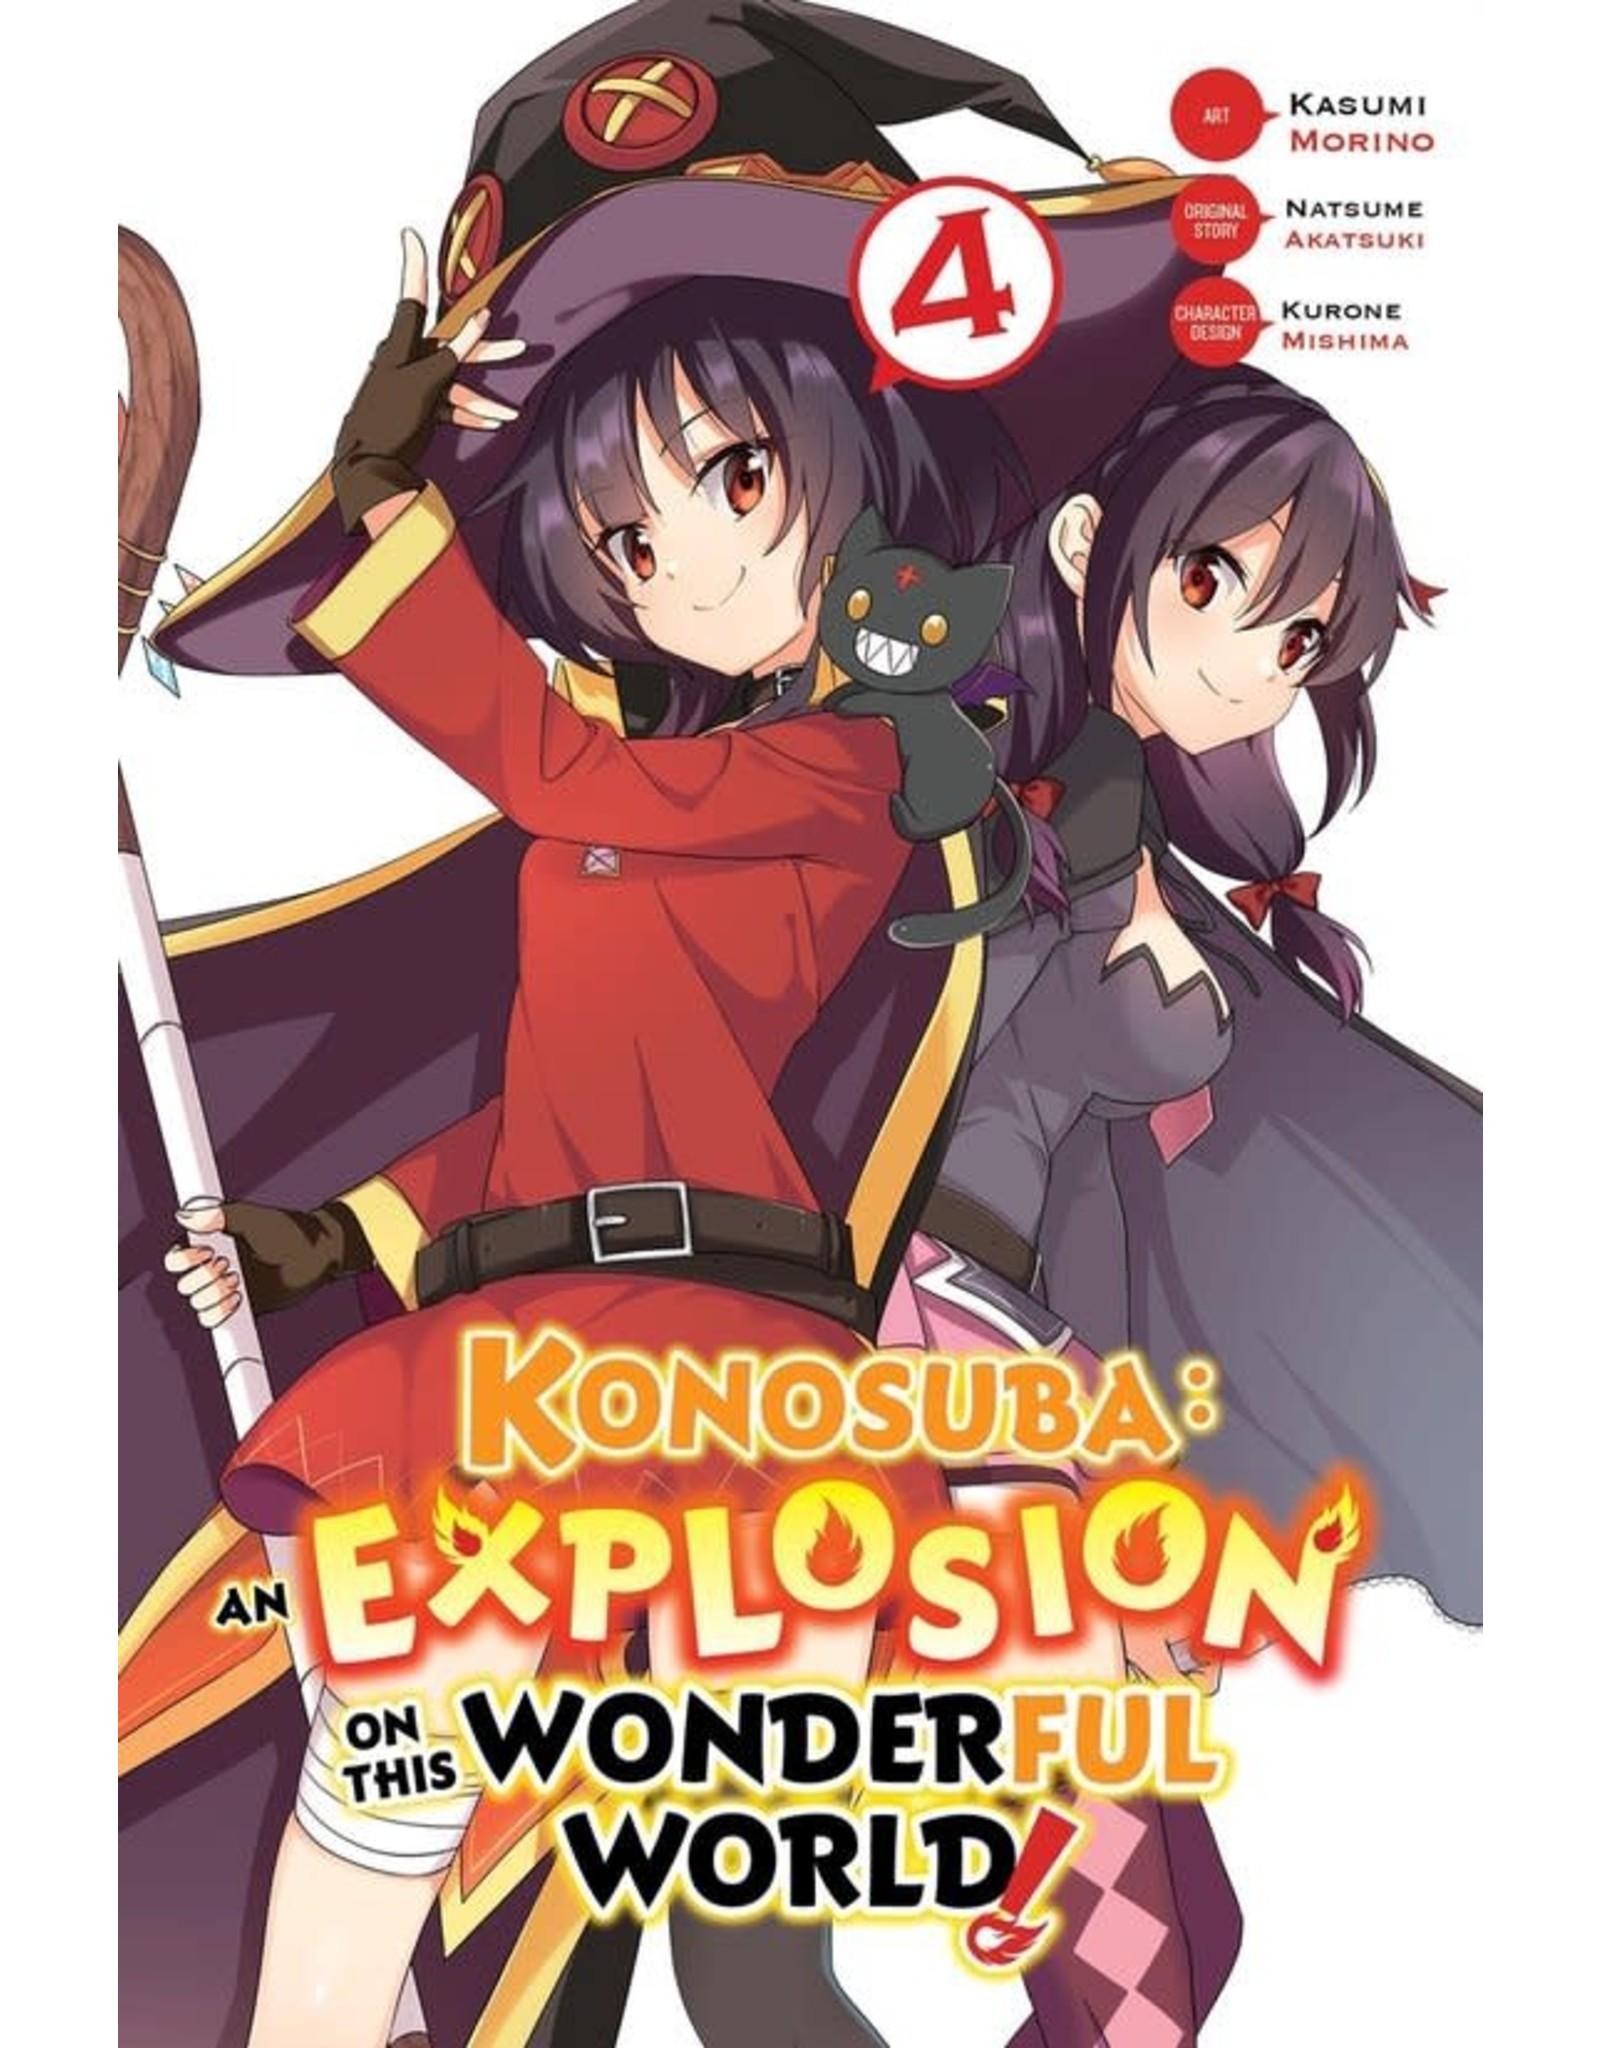 Konosuba: An Explosion On This Wonderful World! 4 (Engelstalig) - Manga